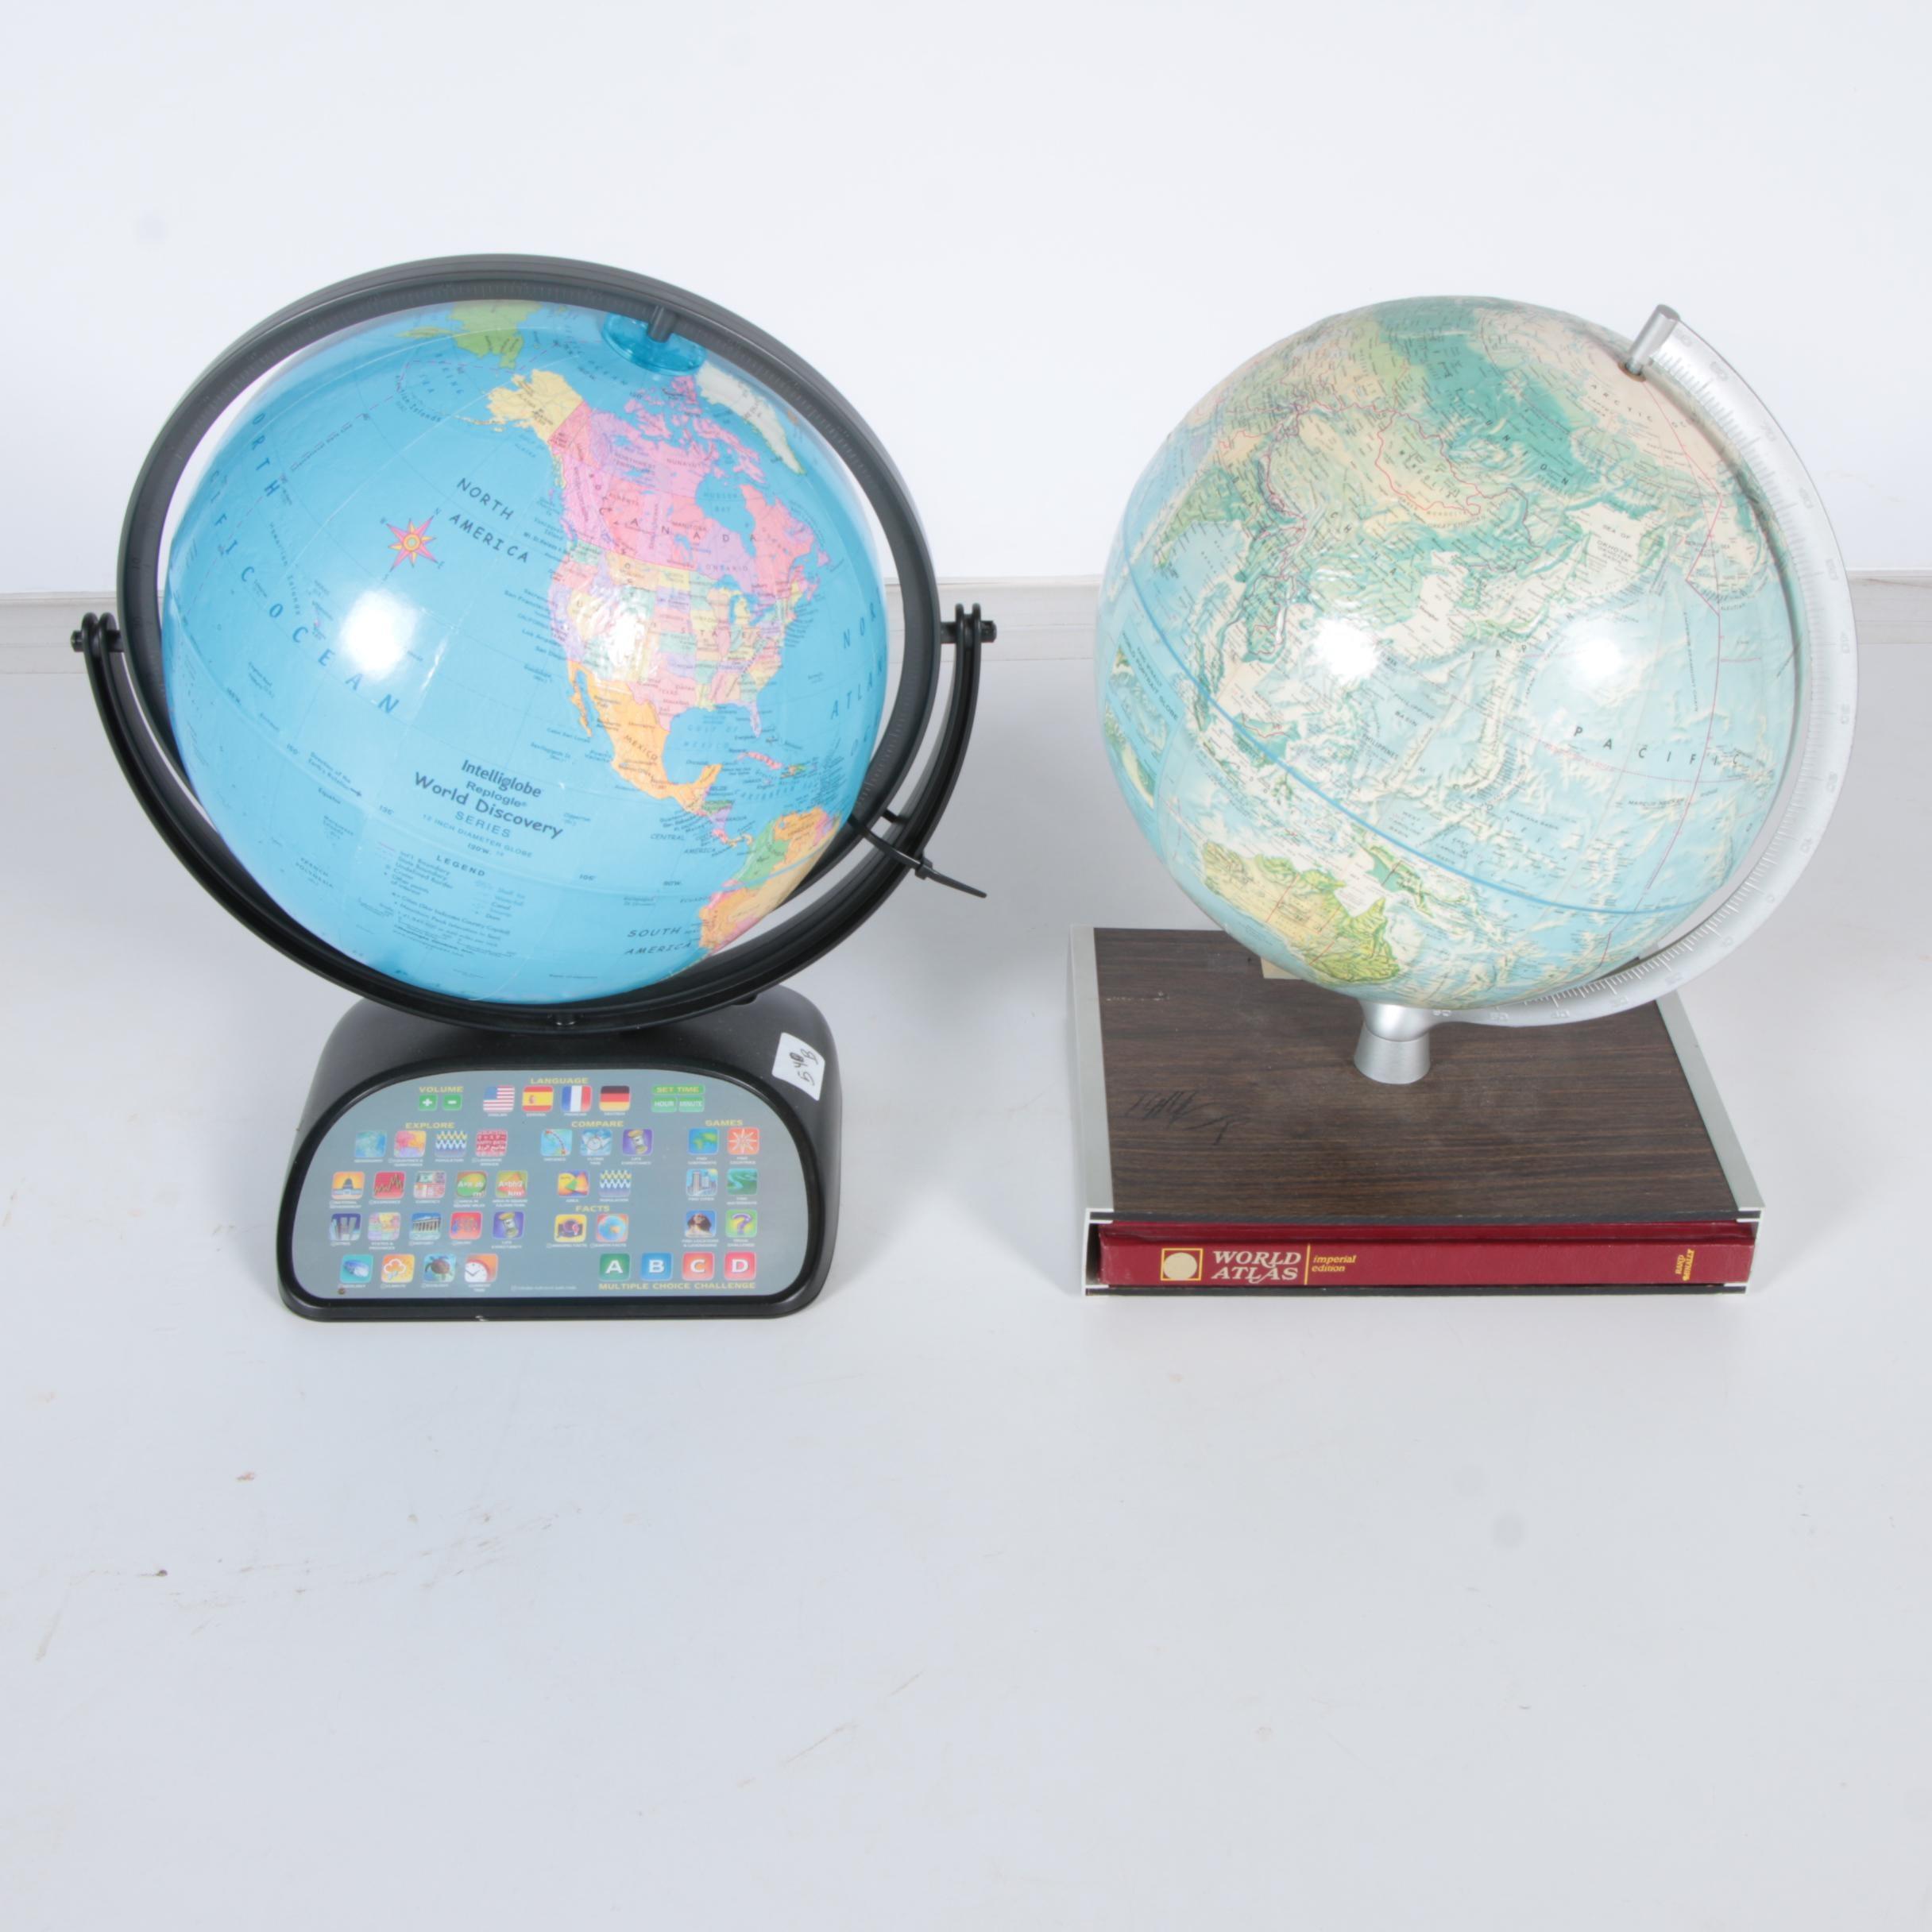 Pair of Globes